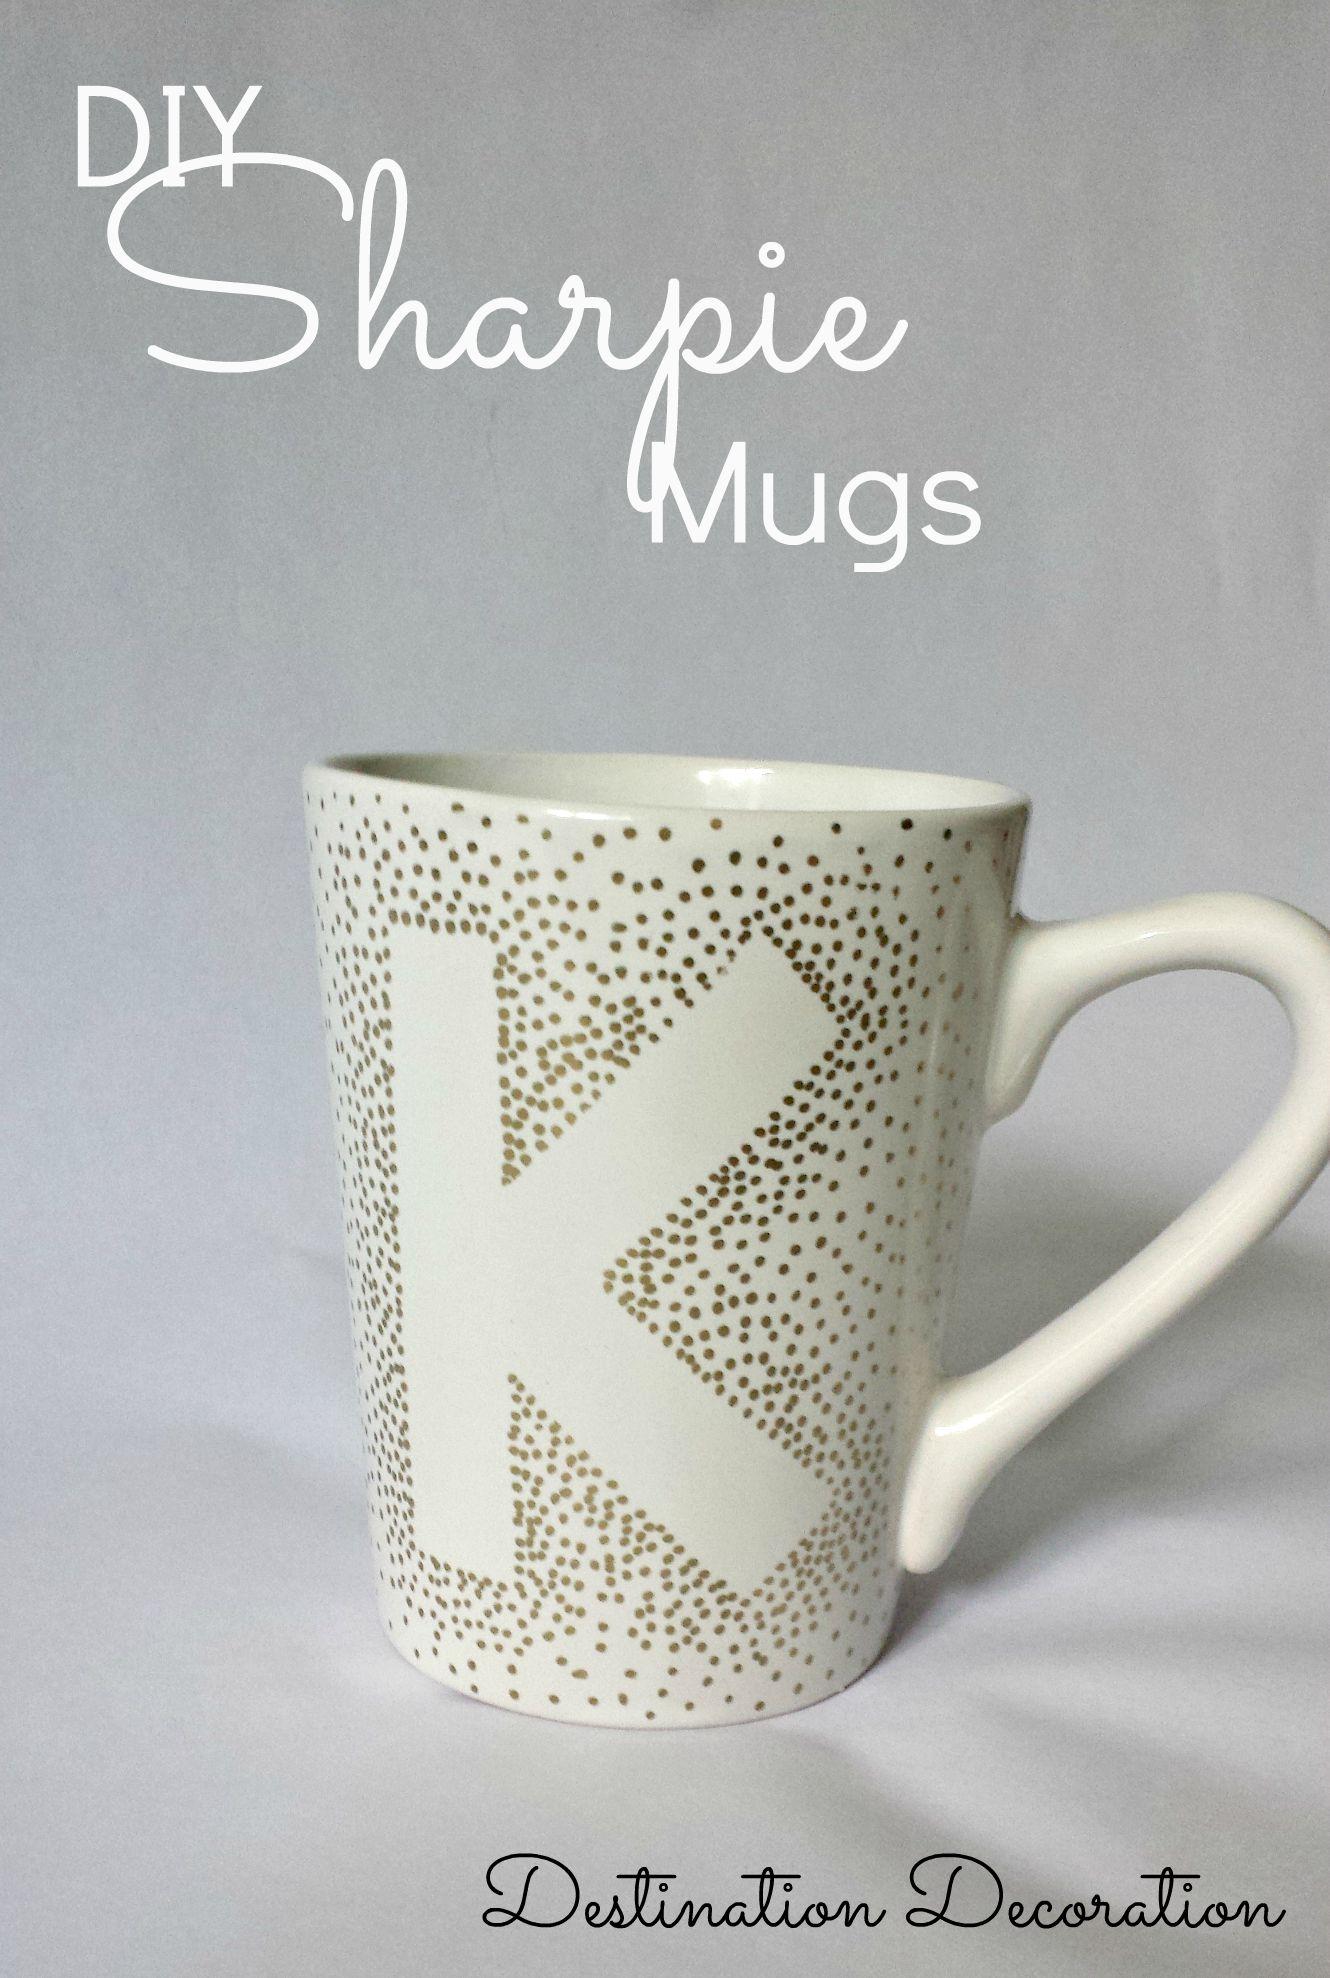 Diy Sharpie Mugs Using Dollar Tree Mugs